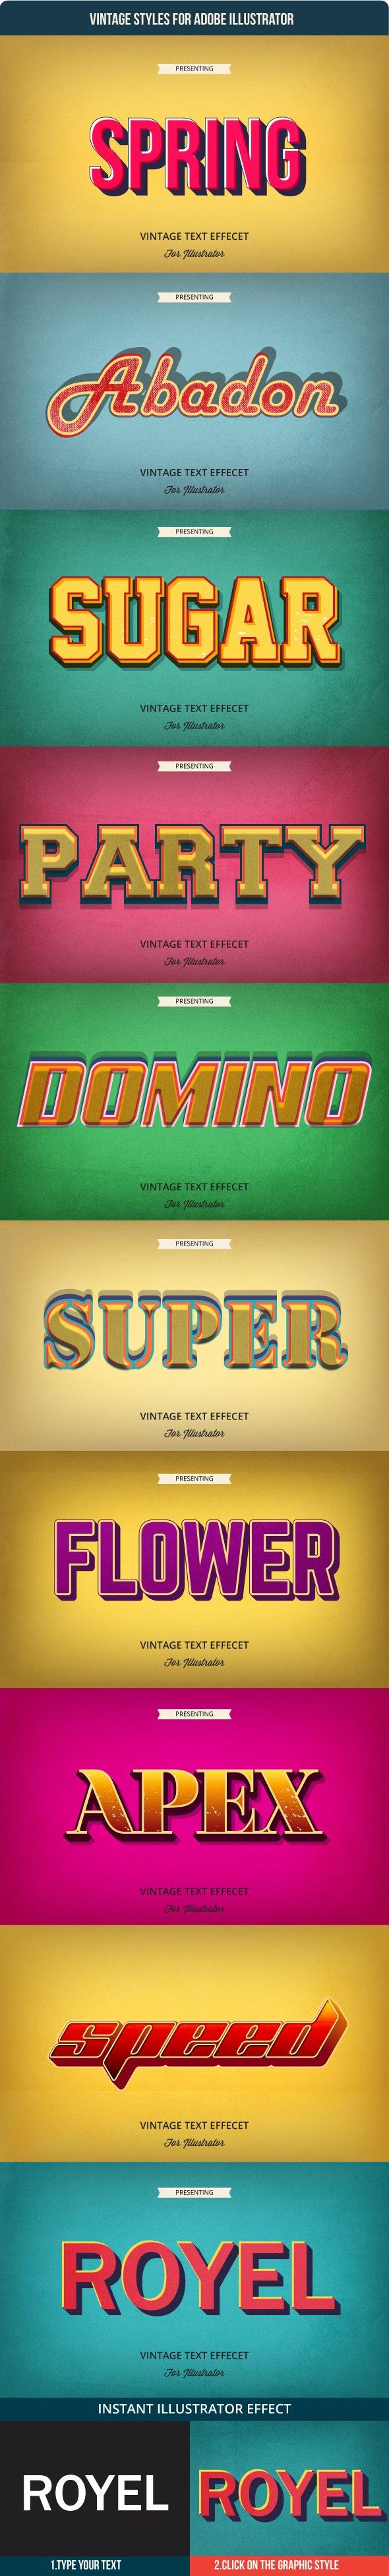 Vintage Graphic Styles for Adobe Illustrator